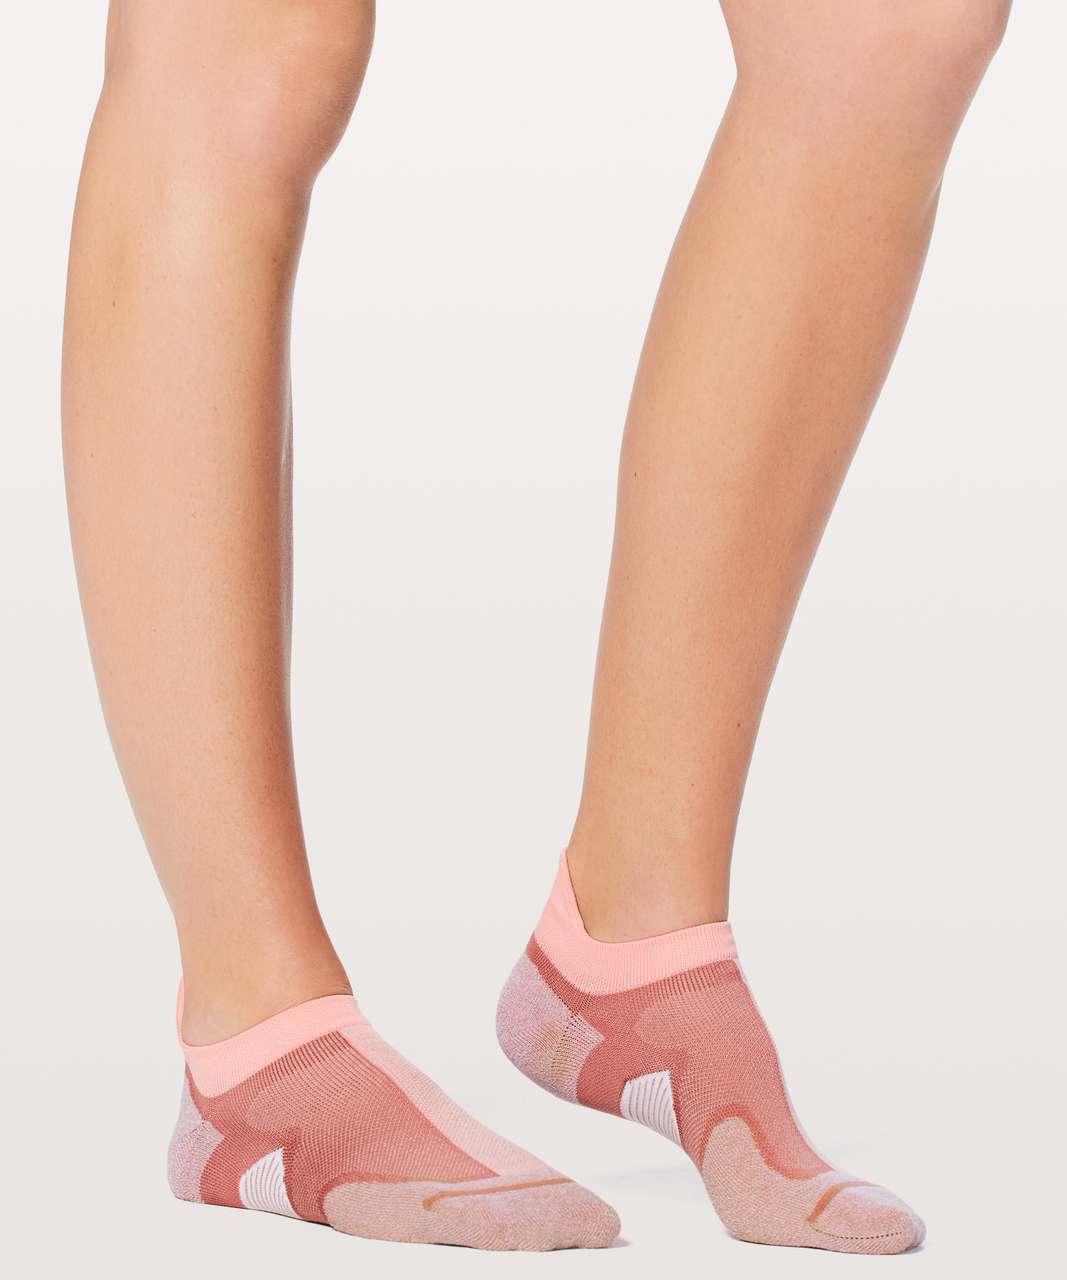 Lululemon Speed Sock *Silver - Quicksand / Cupcake Pink / White